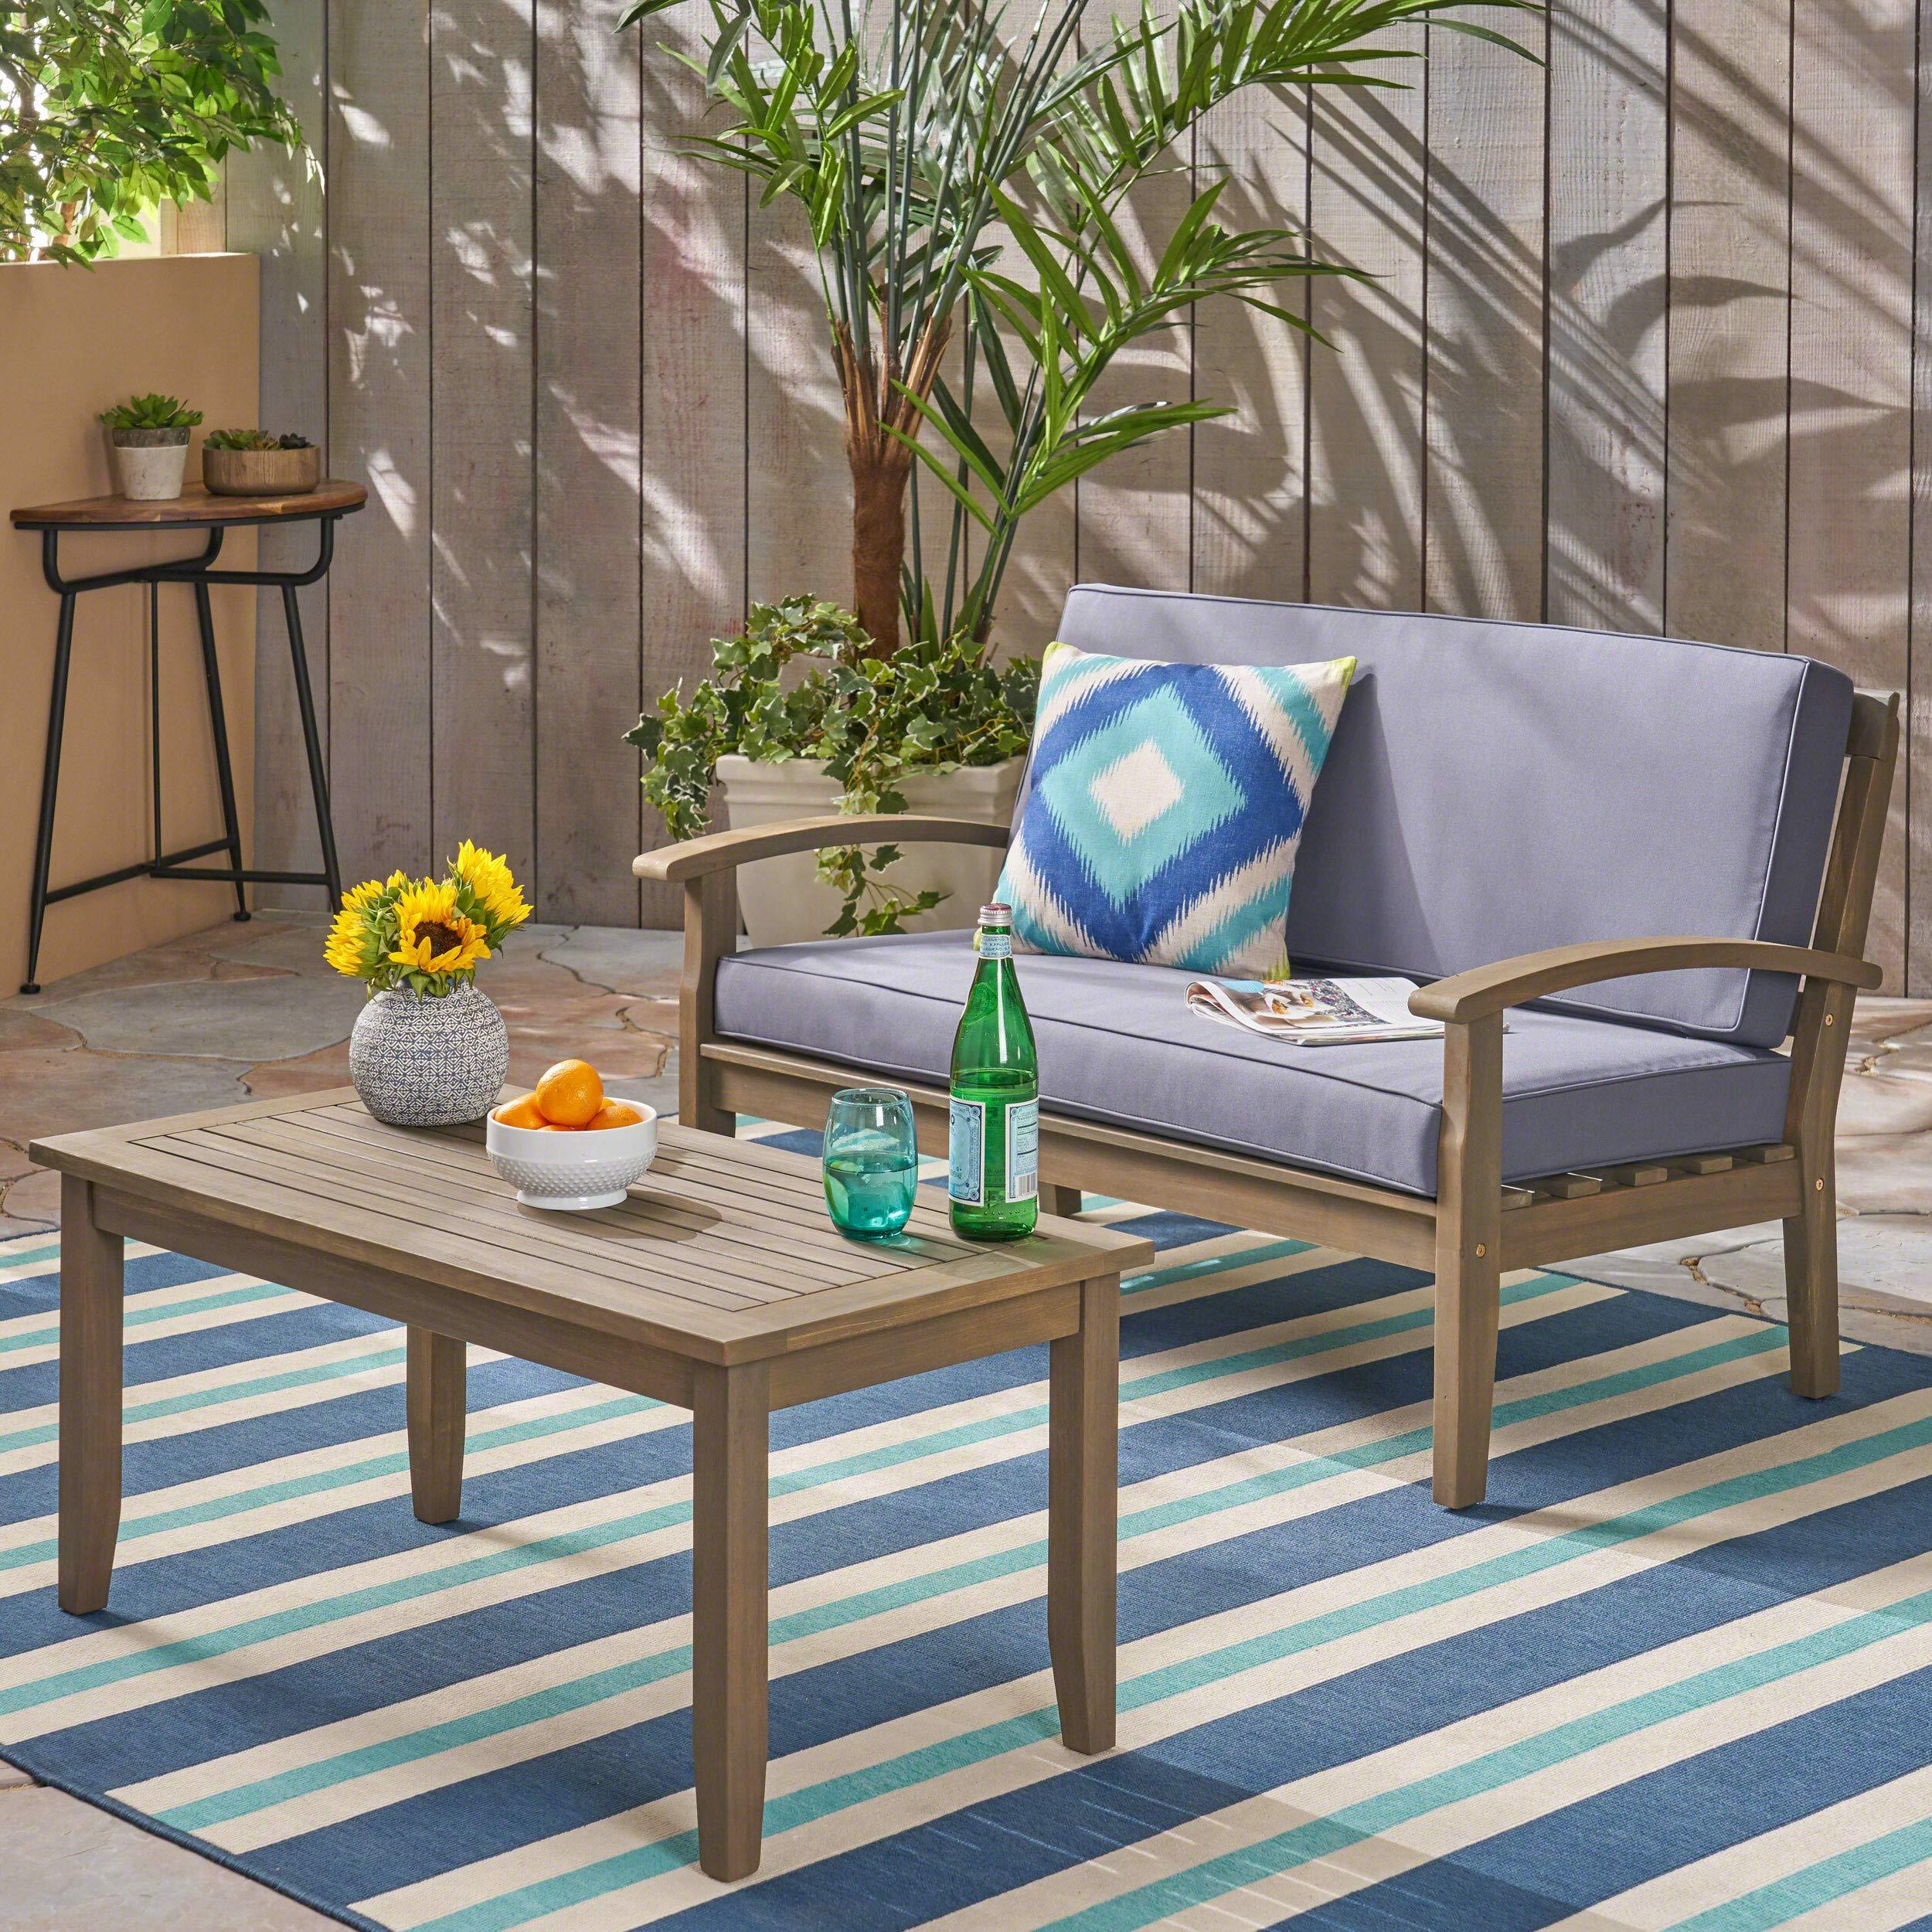 Terrific Preston Outdoor Acacia Wood Loveseat And Coffee Table Gray Evergreenethics Interior Chair Design Evergreenethicsorg